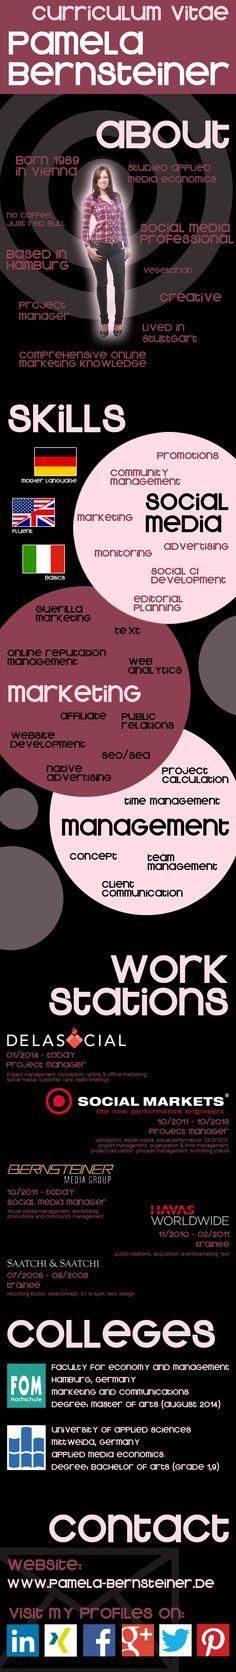 Online Marketing, Social Media Marketing, College Books, Curriculum, Creative, Resume, Infographic, Teaching Plan